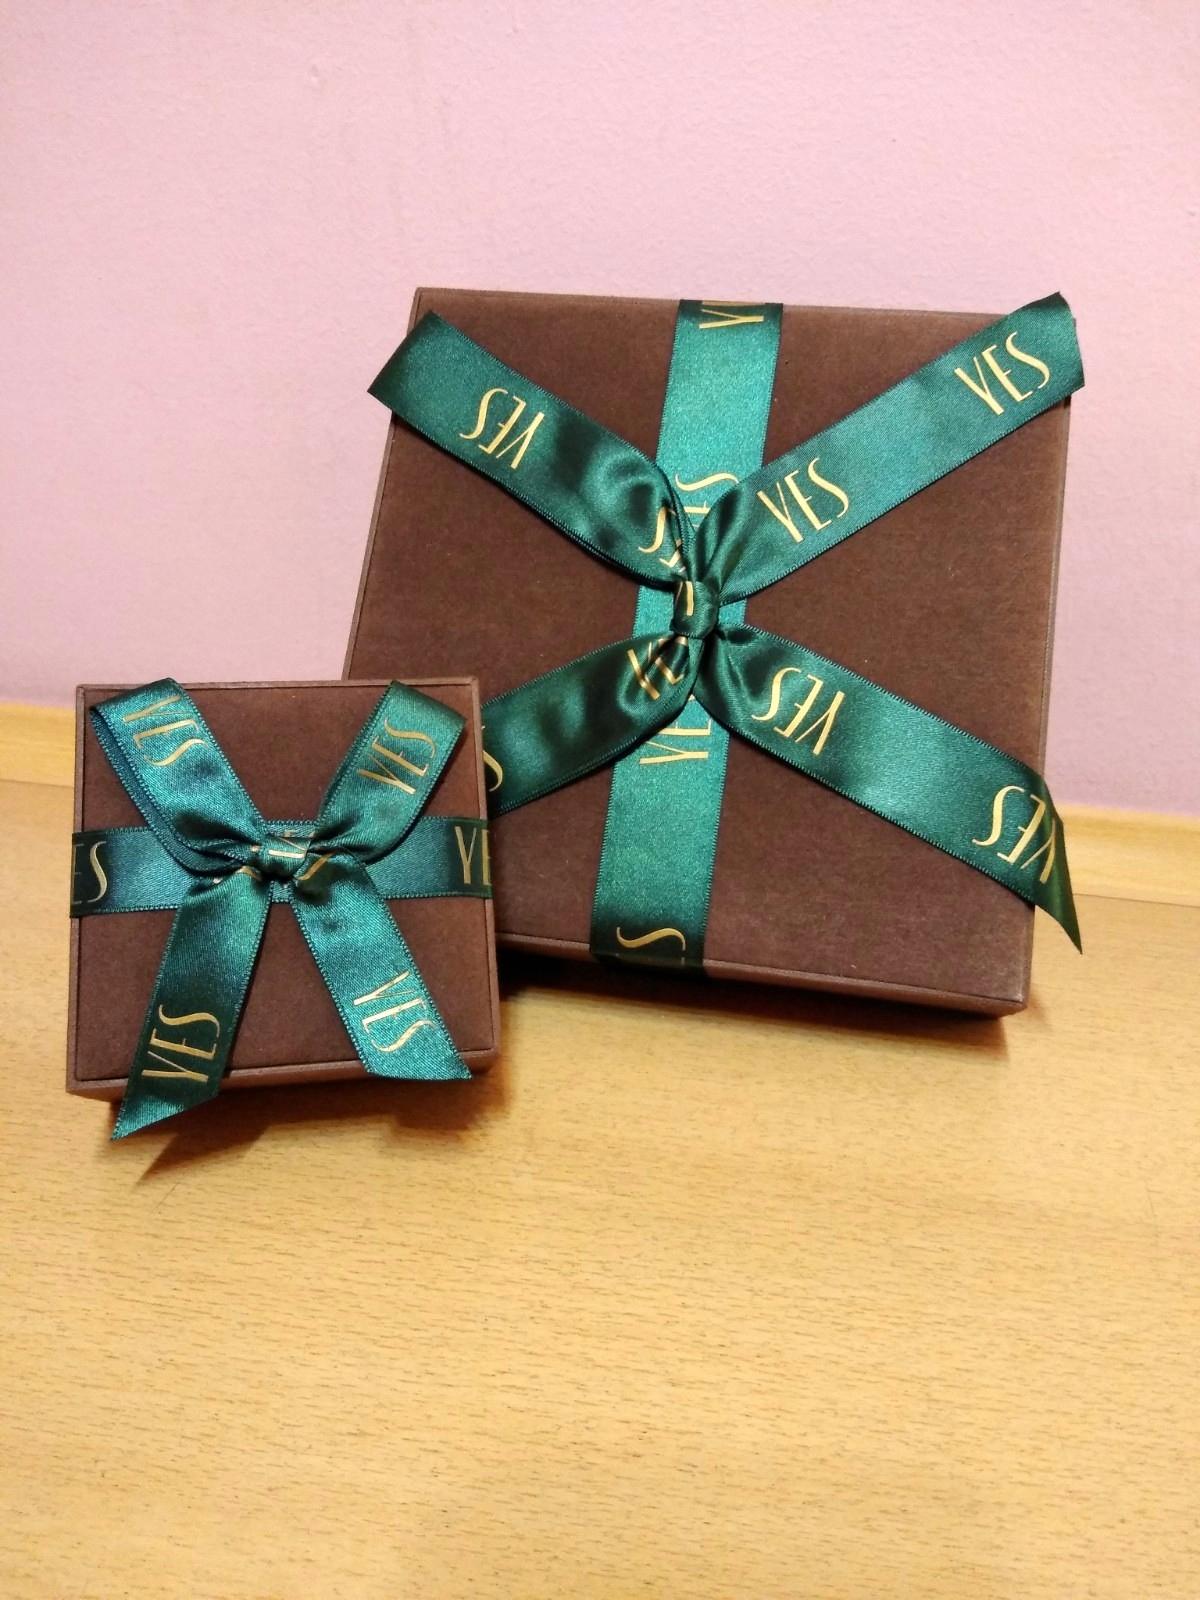 ce092edd16834a YES pudełko szkatułka na biżuterię 2 sztuki - 7858640274 - oficjalne ...